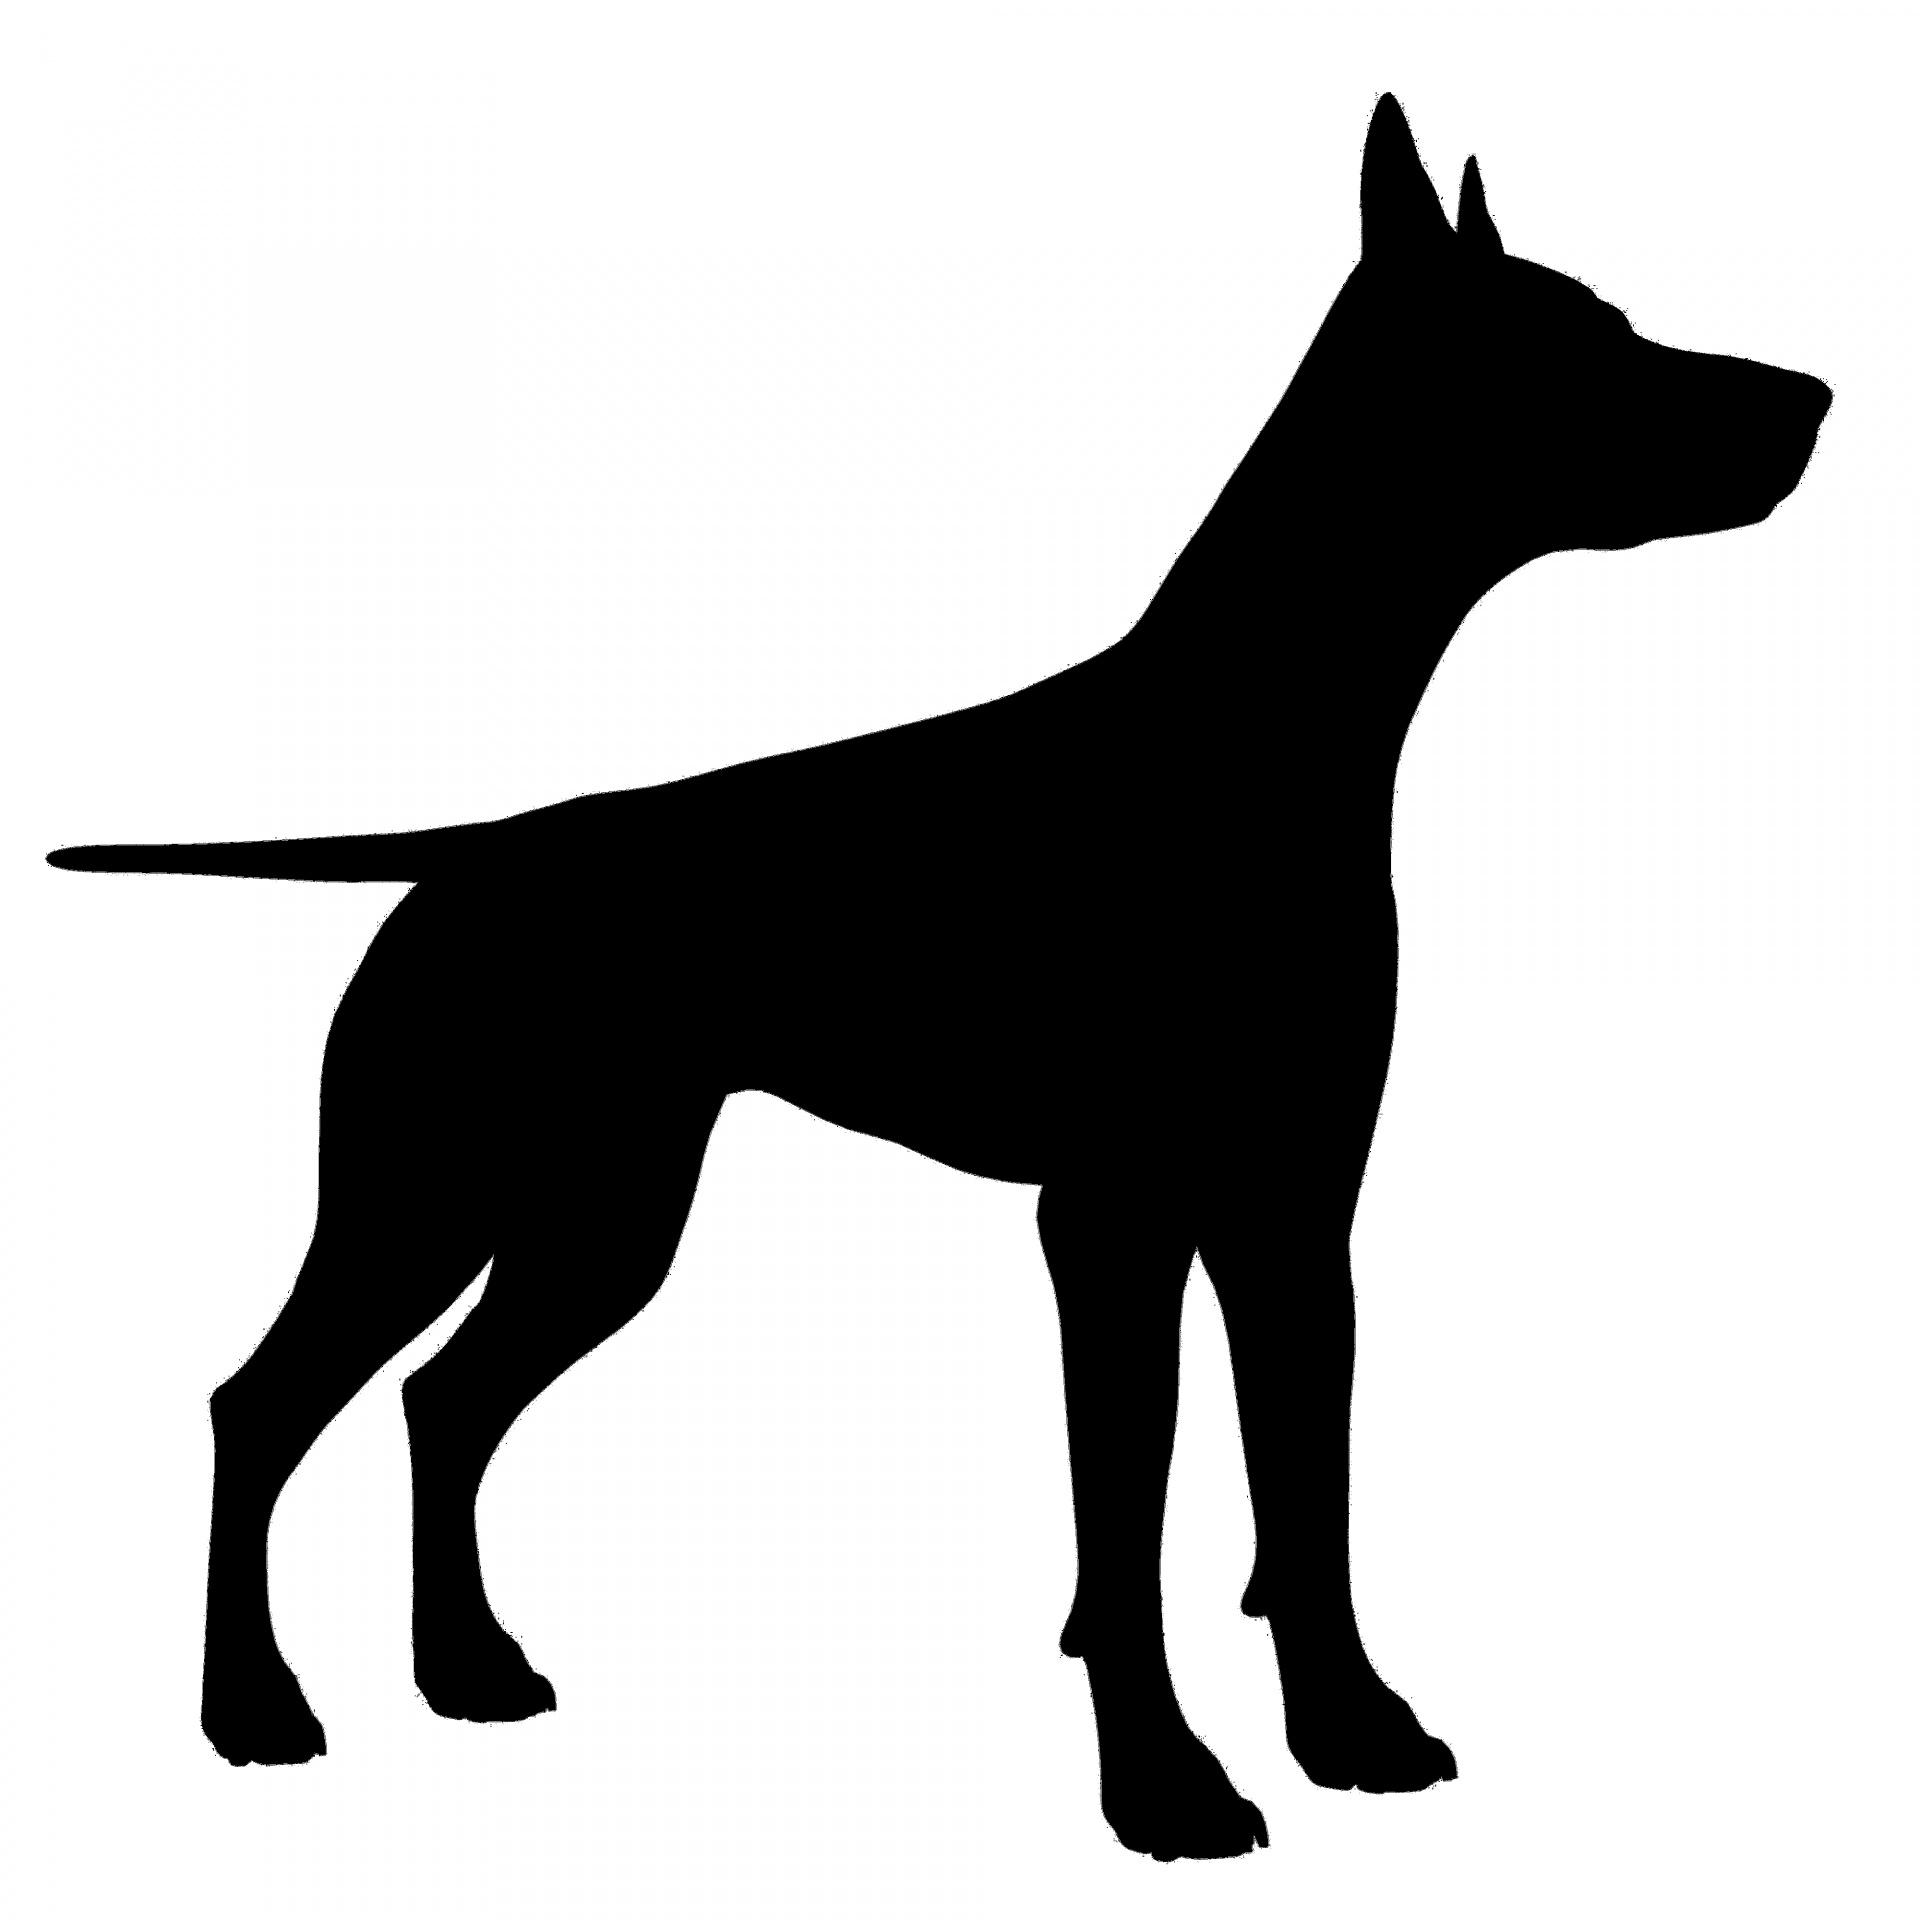 1920x1920 Dog Silhouette Free Stock Photo